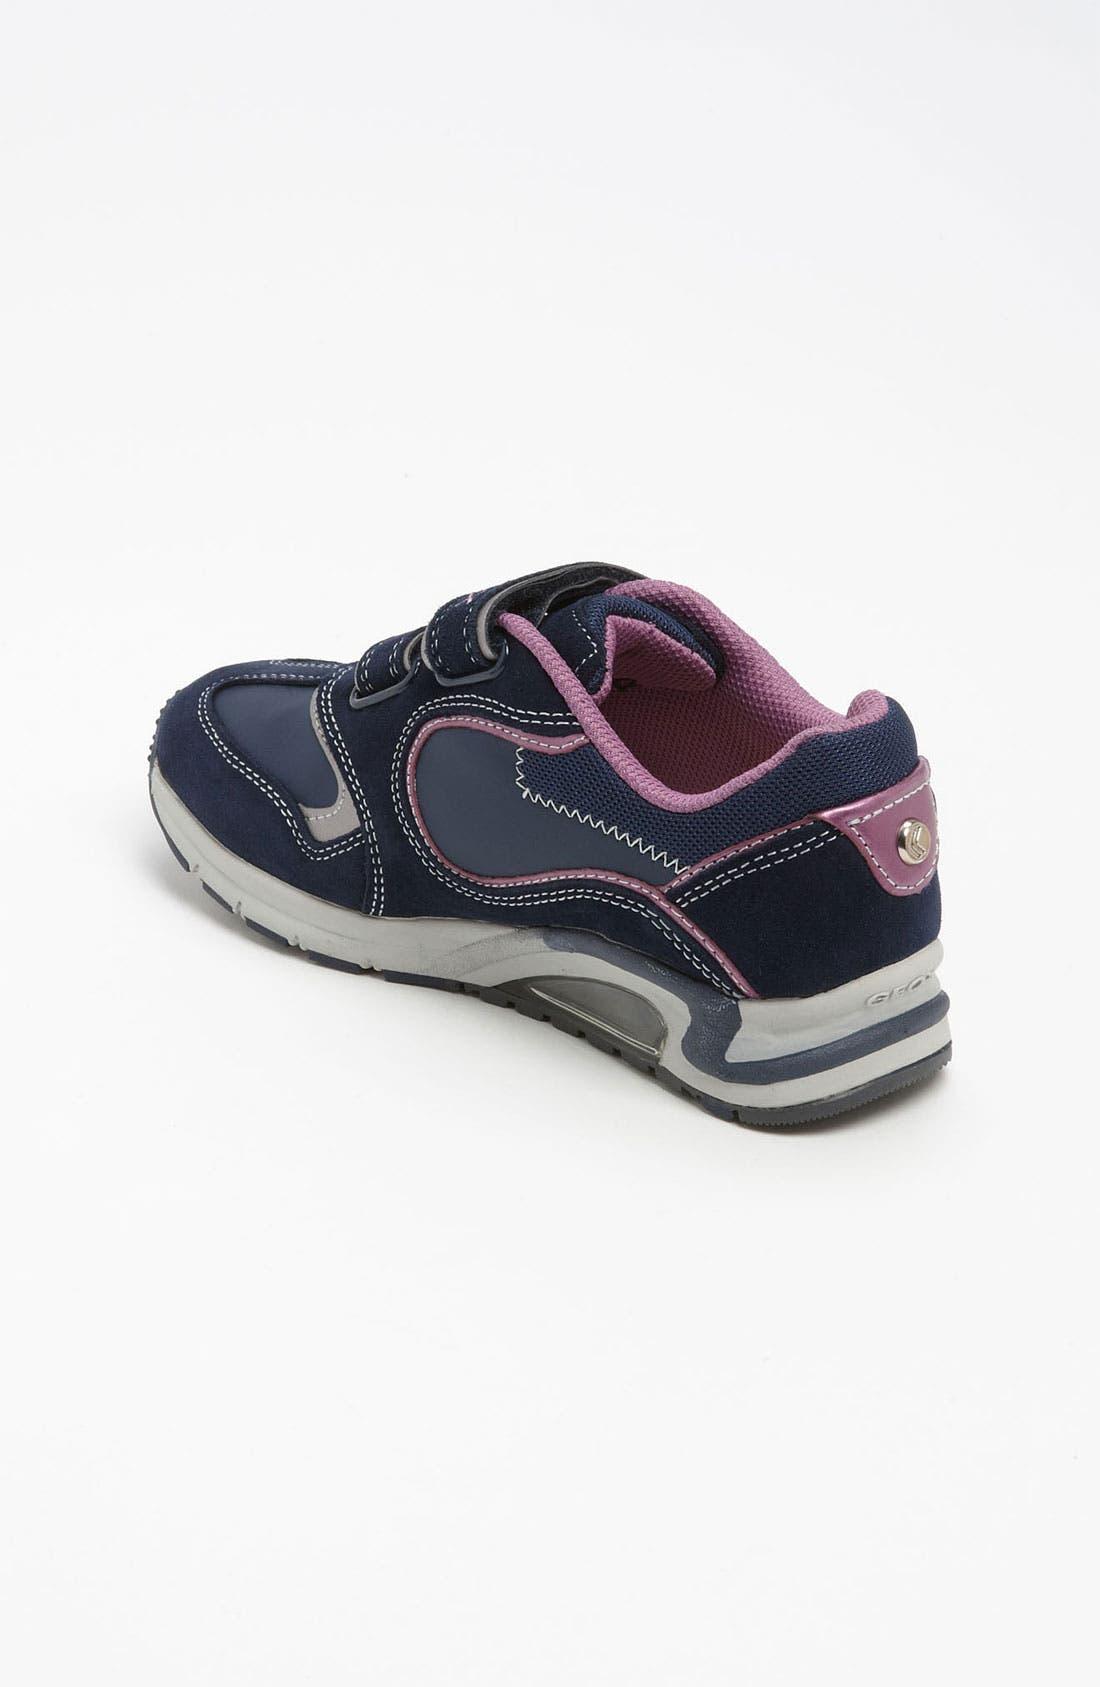 Alternate Image 2  - Geox 'Shaky' Sneaker (Toddler, Little Kid & Big Kid)